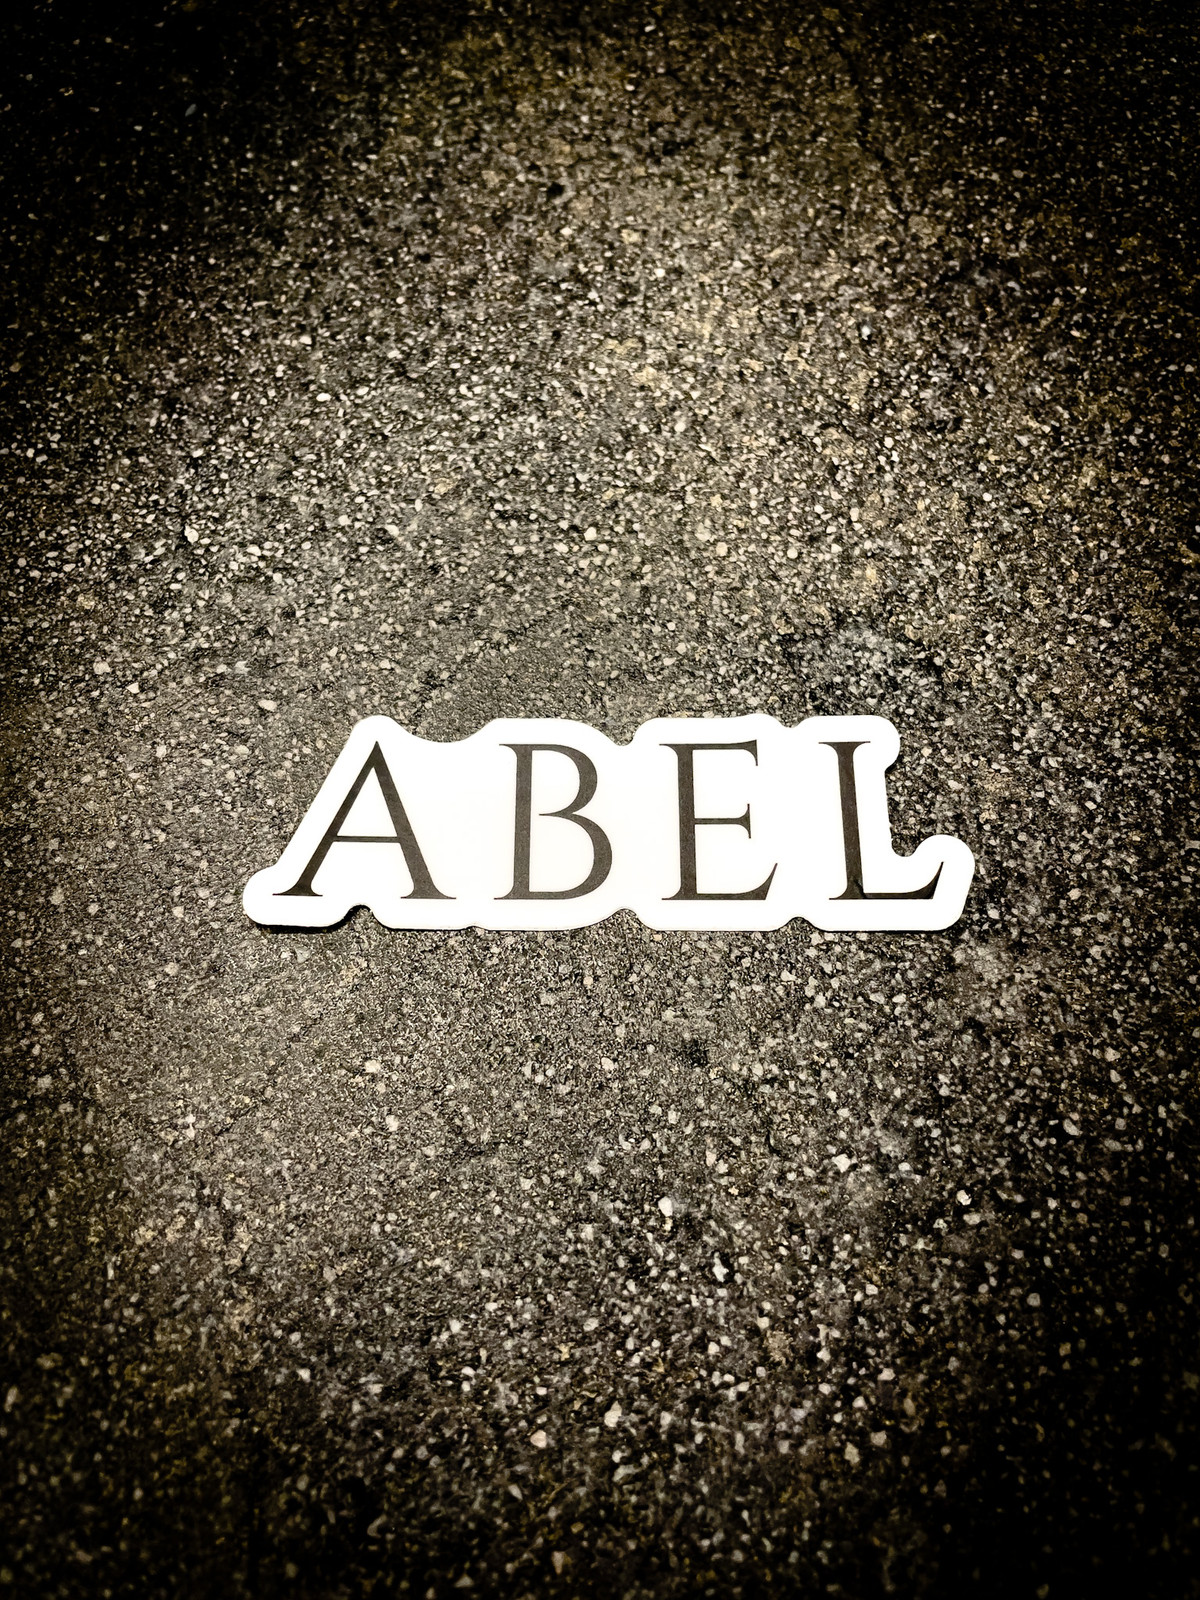 Abel Company brand sticker on concrete background, black ABEL typeface on white contrast